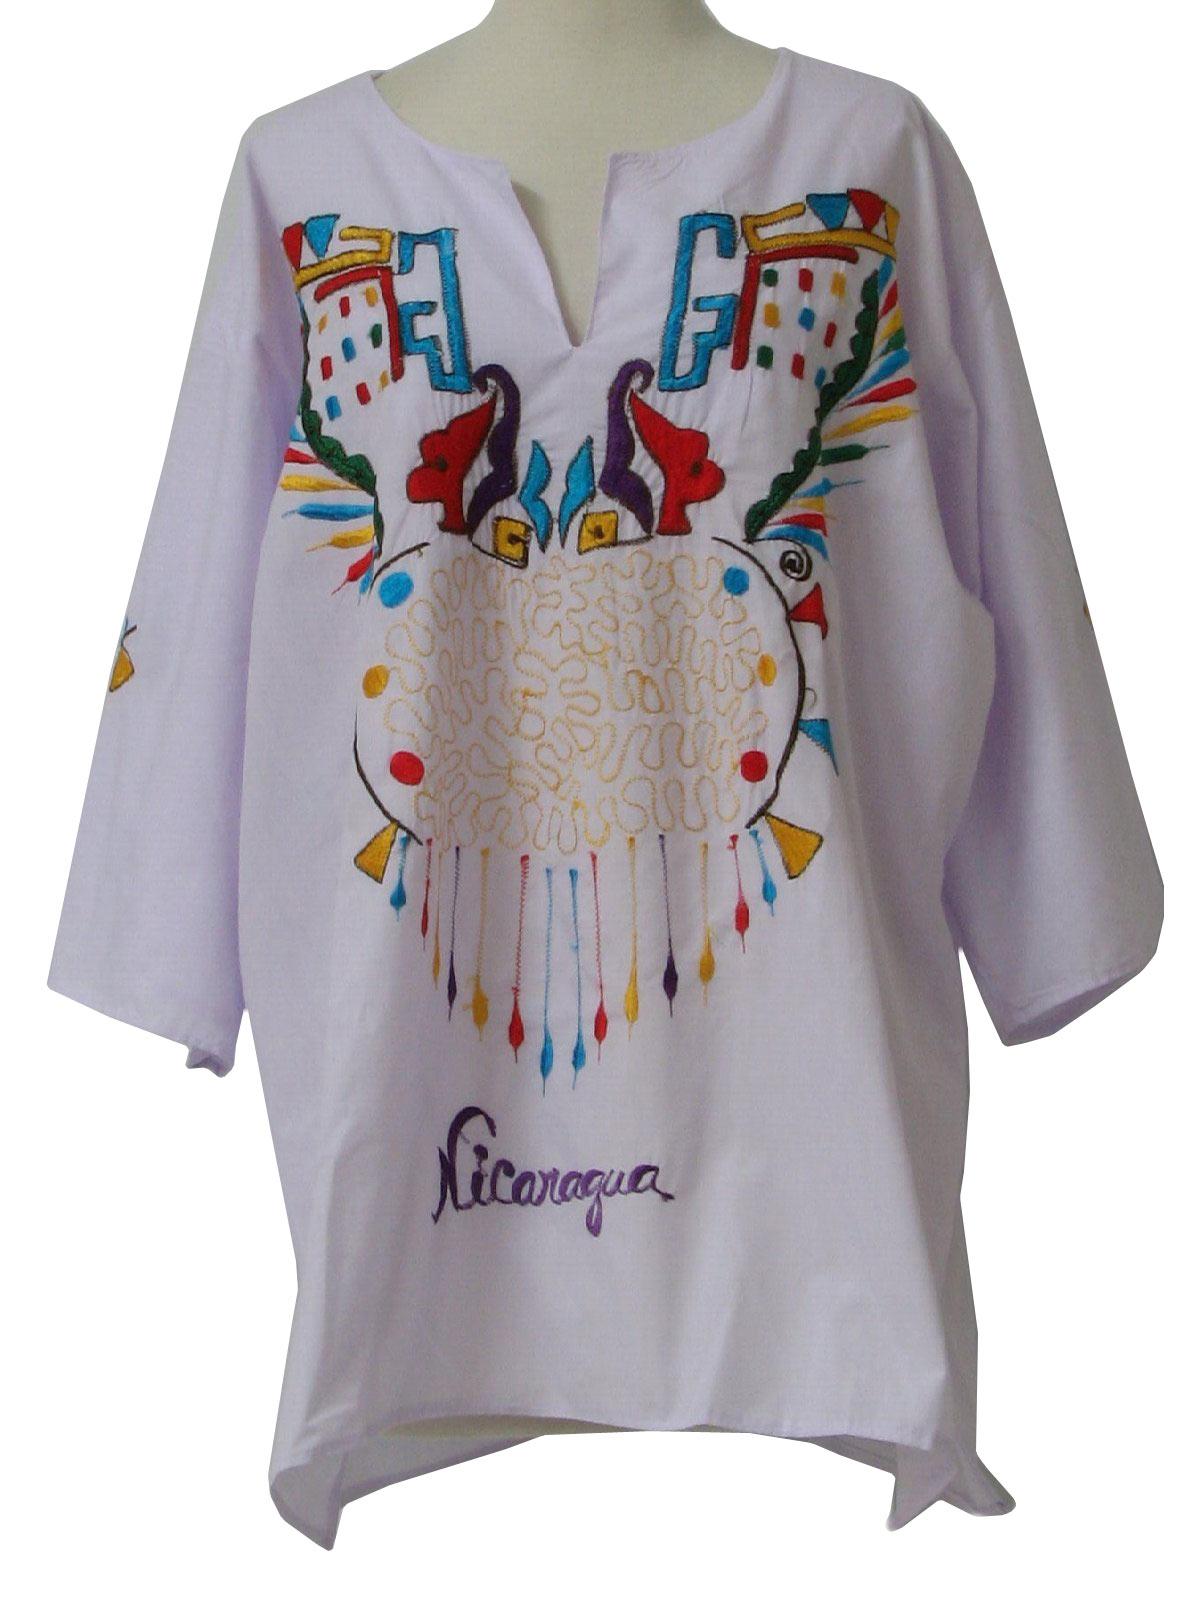 1980s Retro Hippie Shirt 80s Made in Nicaragua Unisex